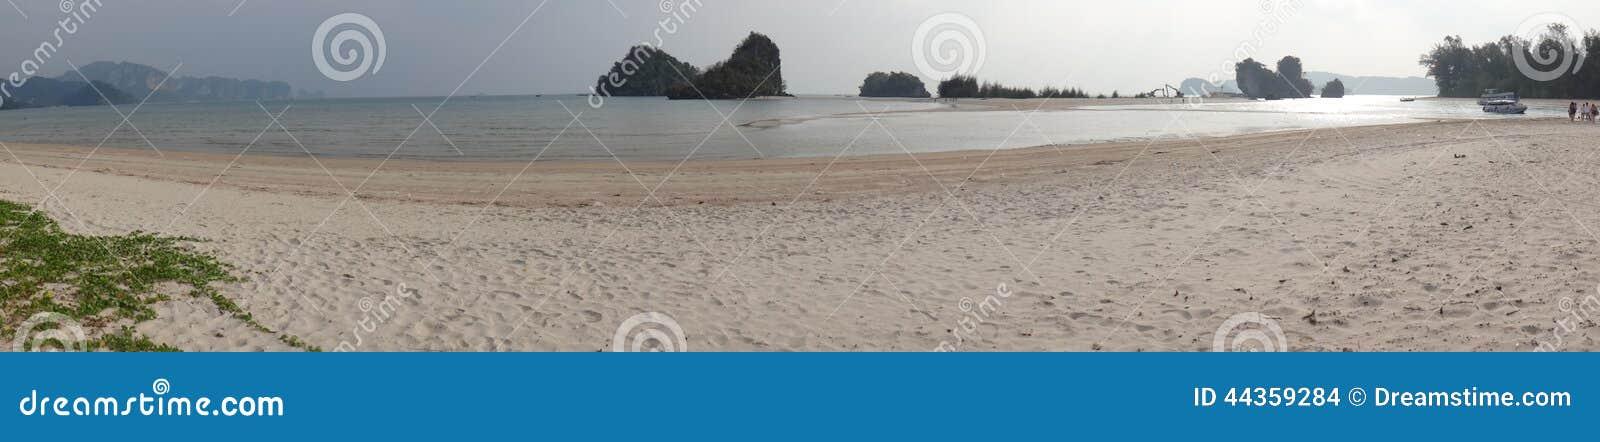 La Tailandia, Krabi, spiaggia di Nopparat Thara